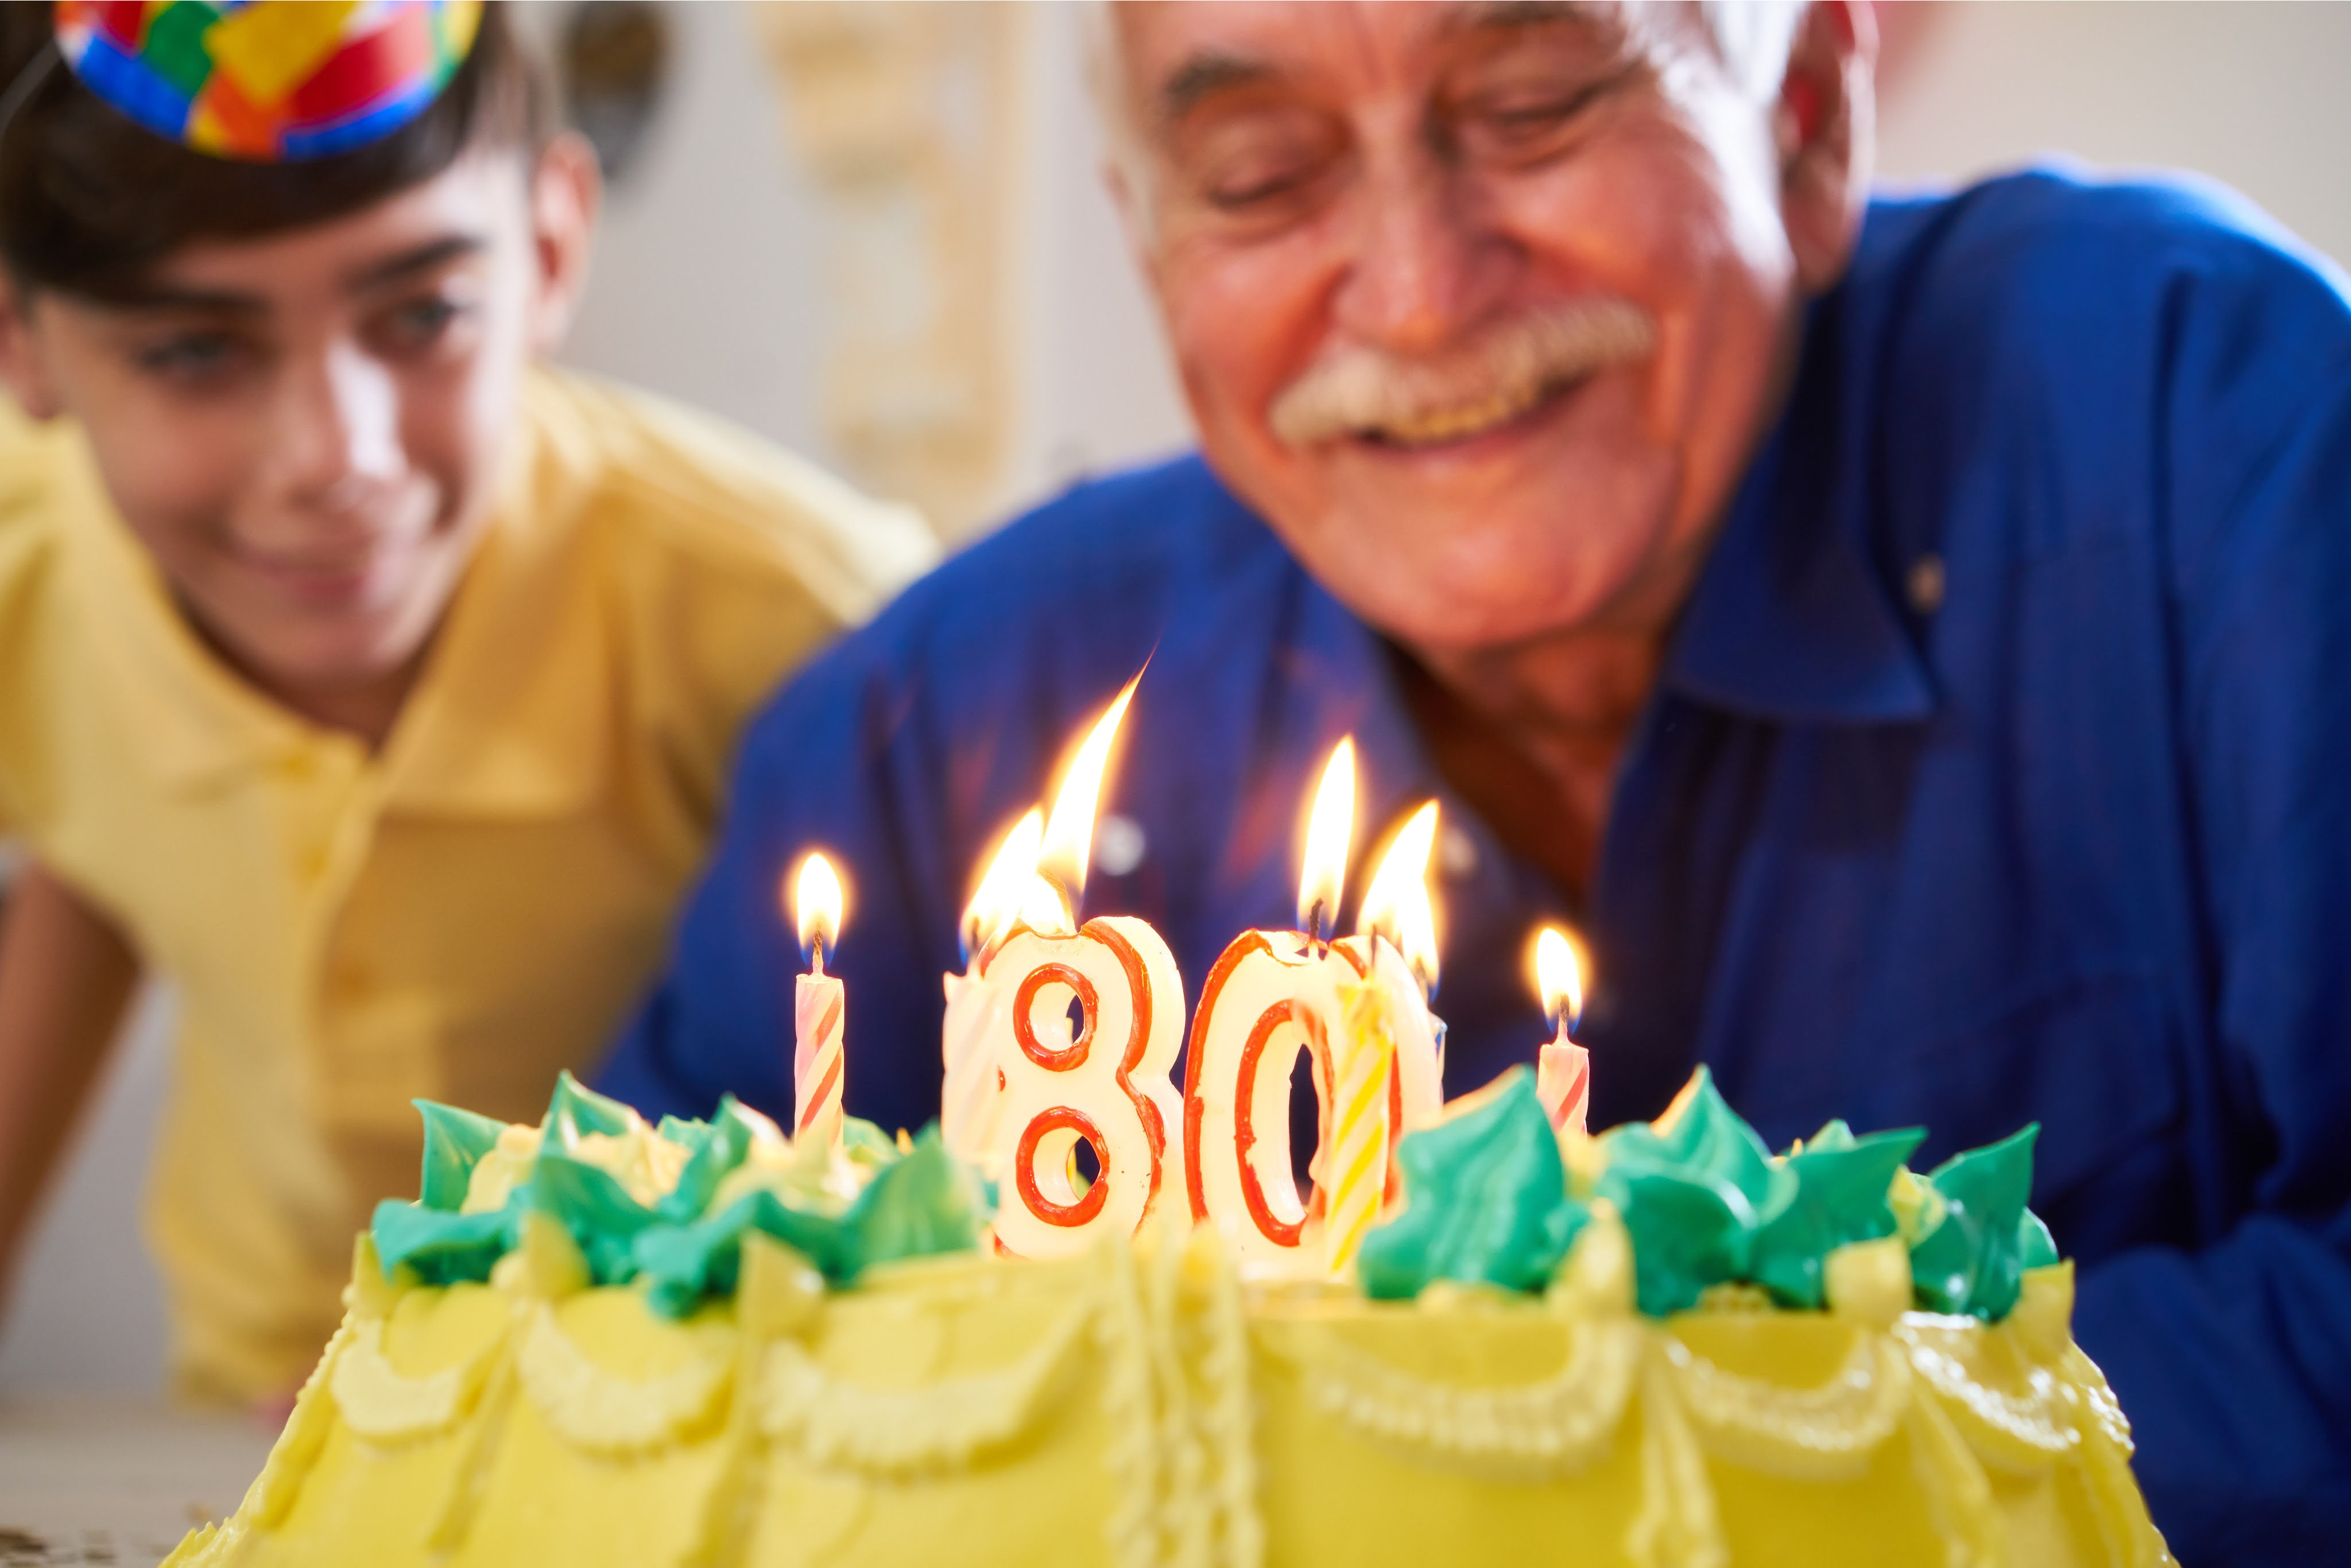 80th-birthday-ideas-for-men